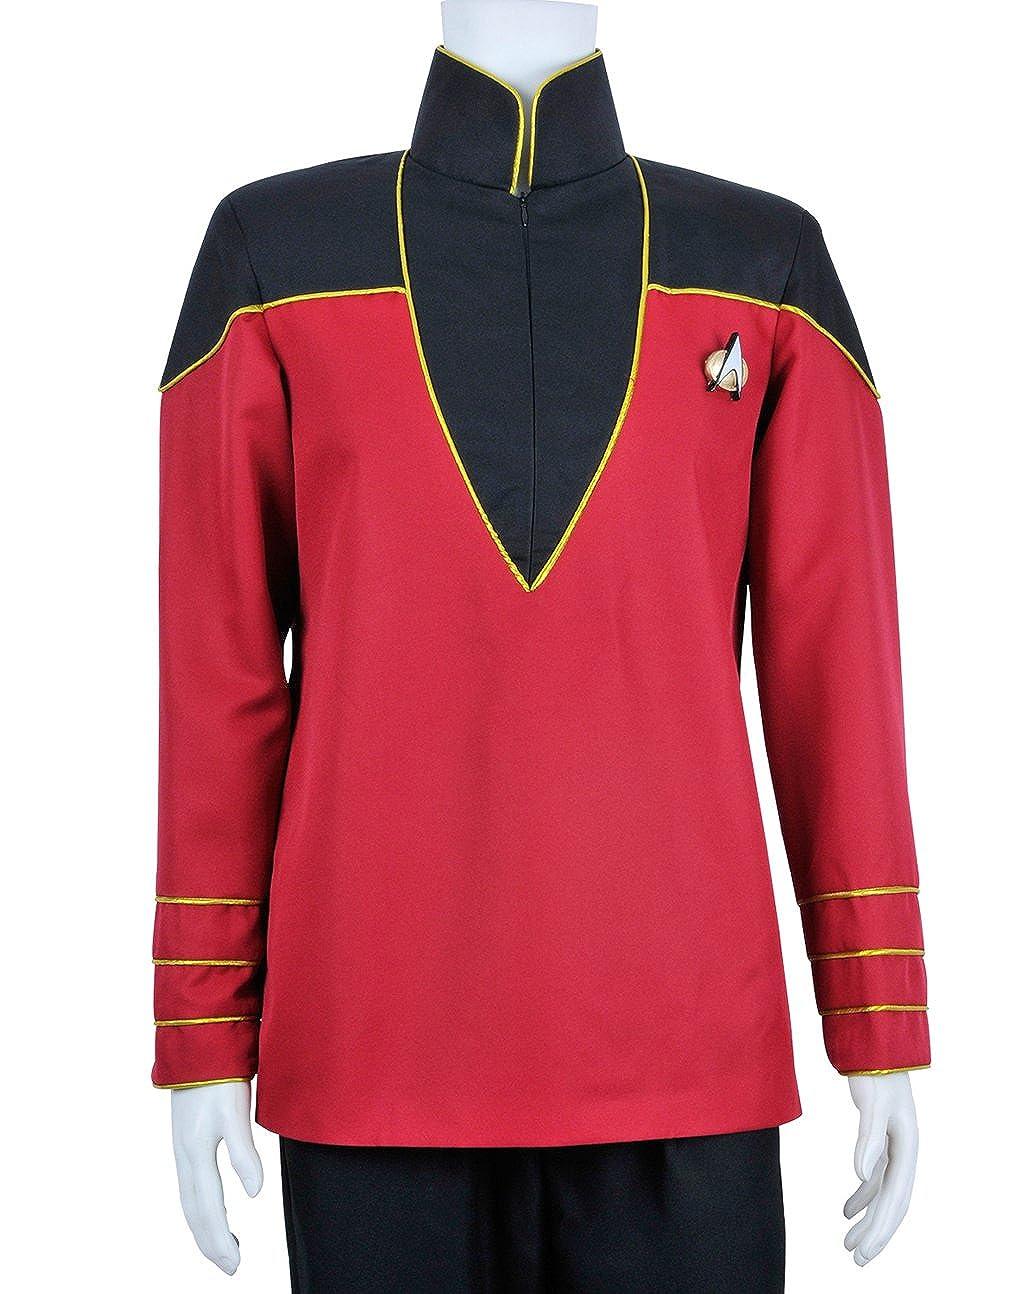 XOMO Star Trek Admiral Uniform Costume Jacket